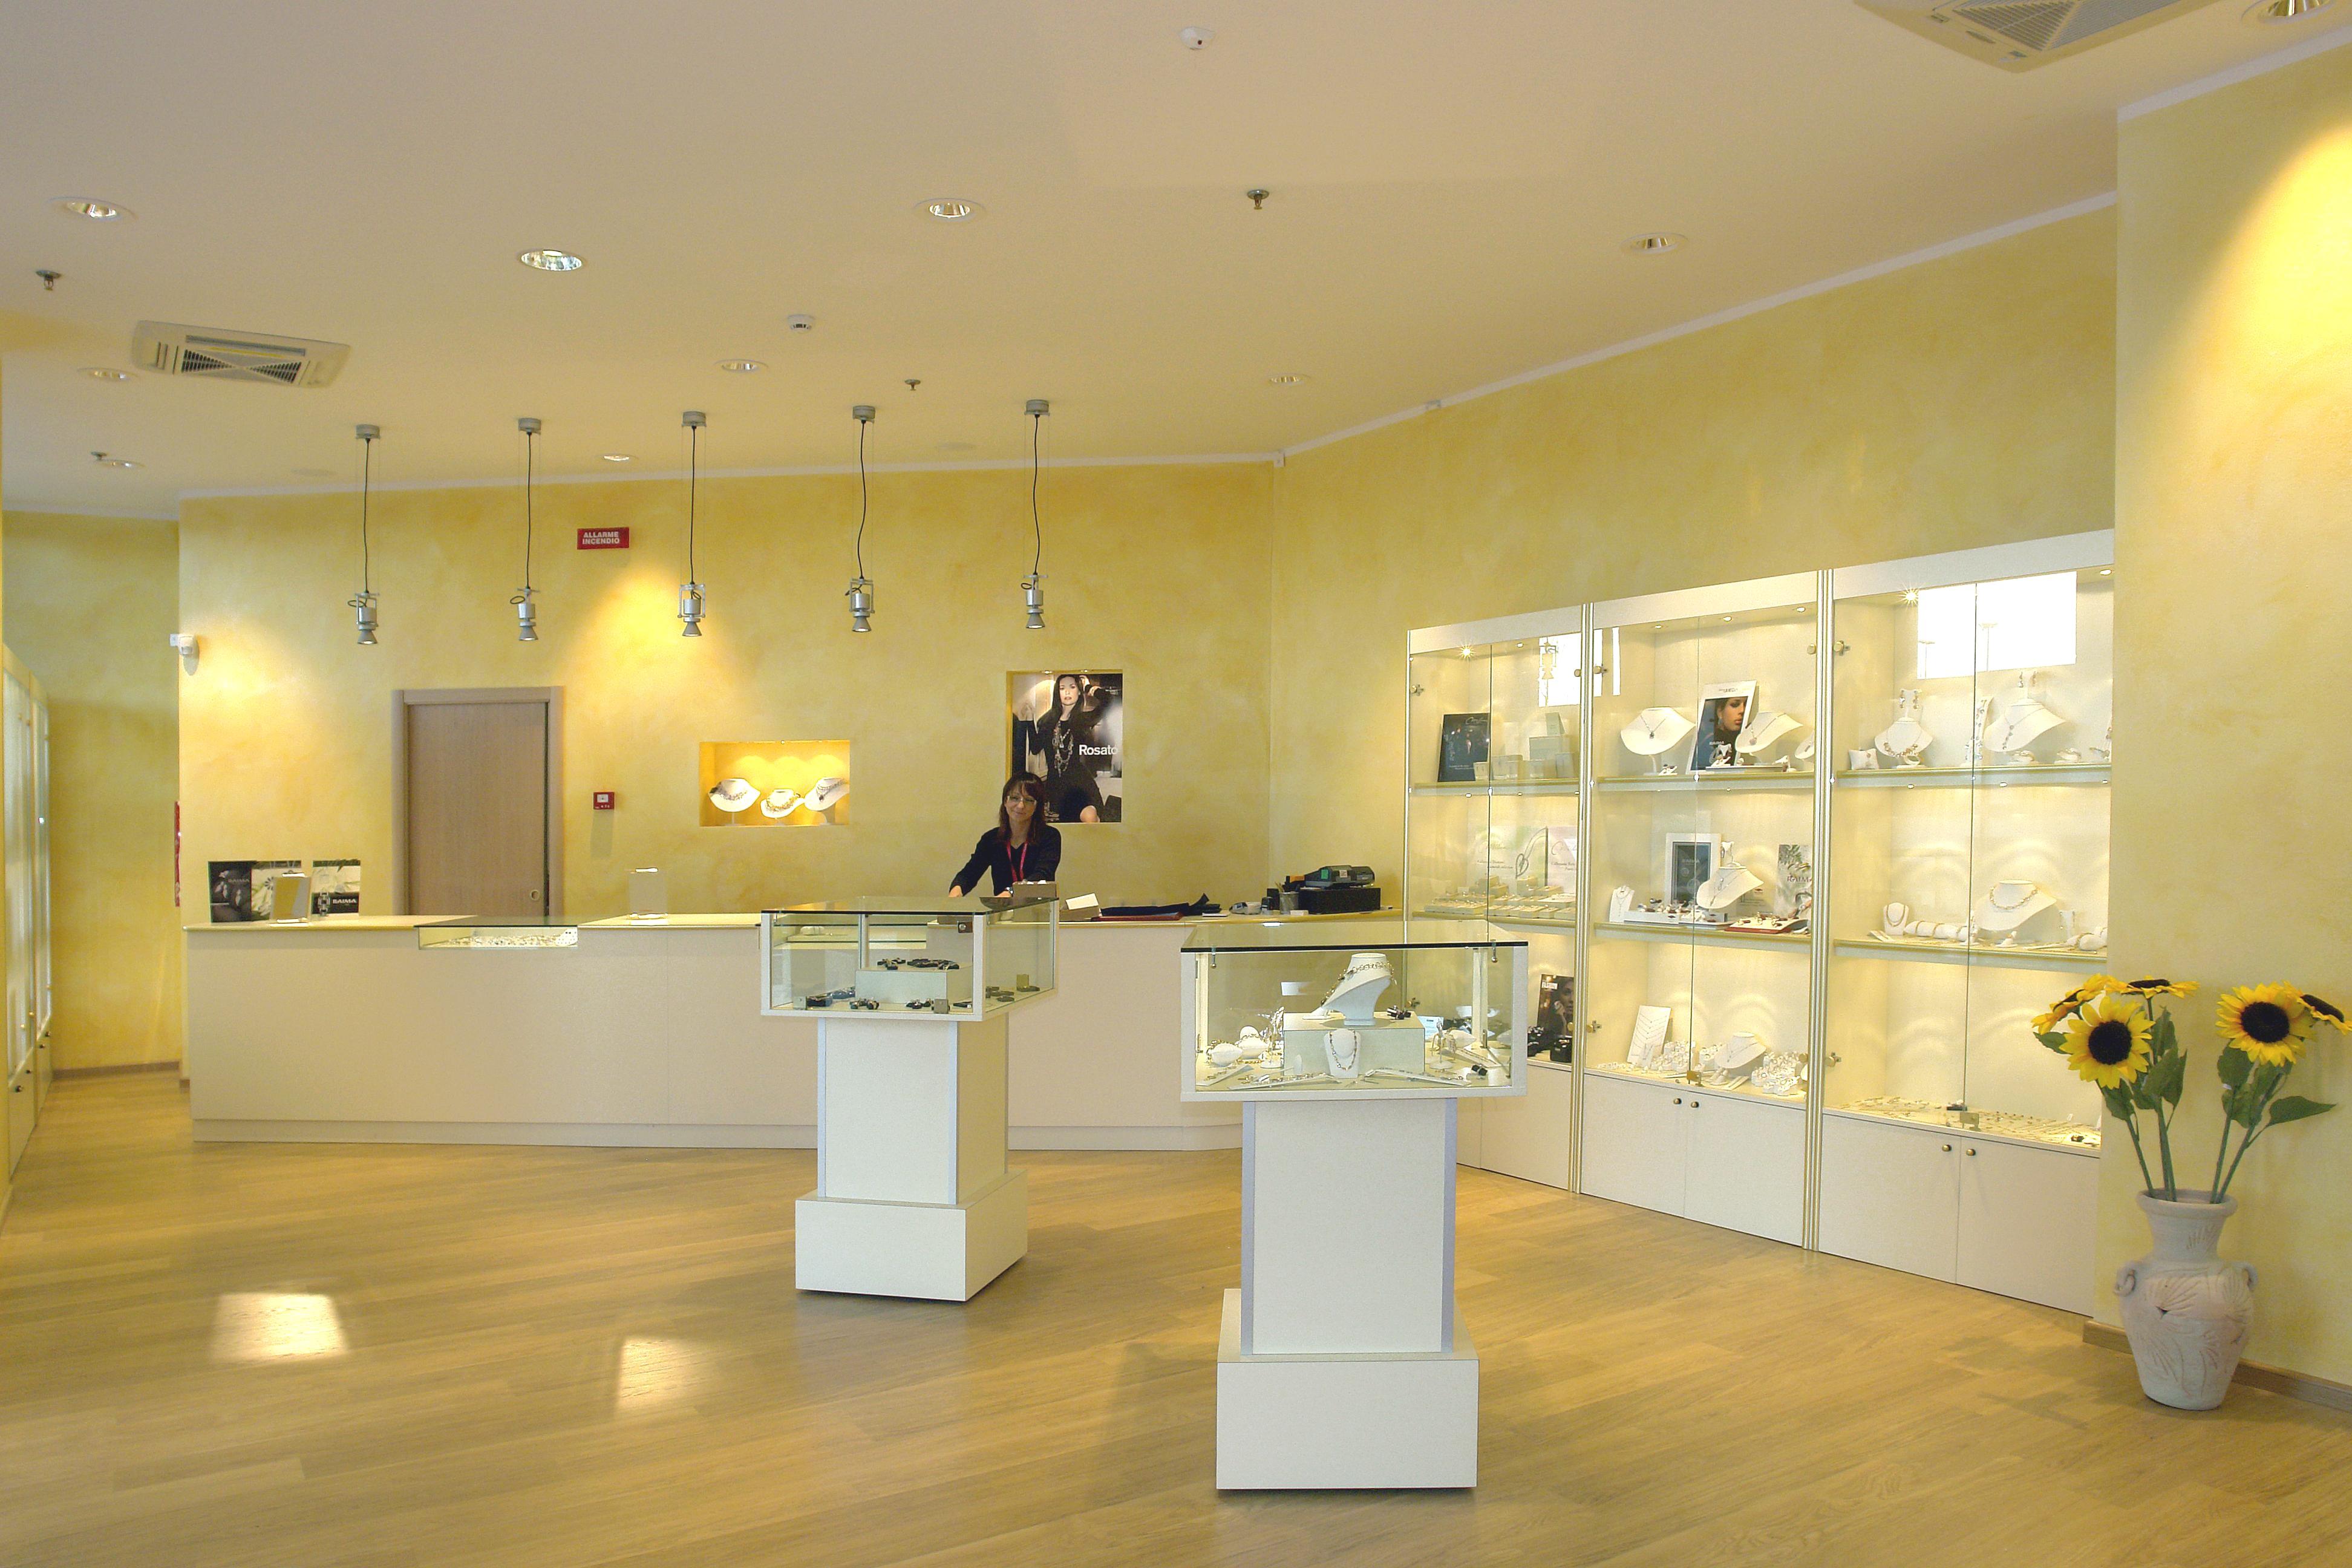 Arredamenti per gioiellerie compra in fabbrica a met for Negozi per mobili